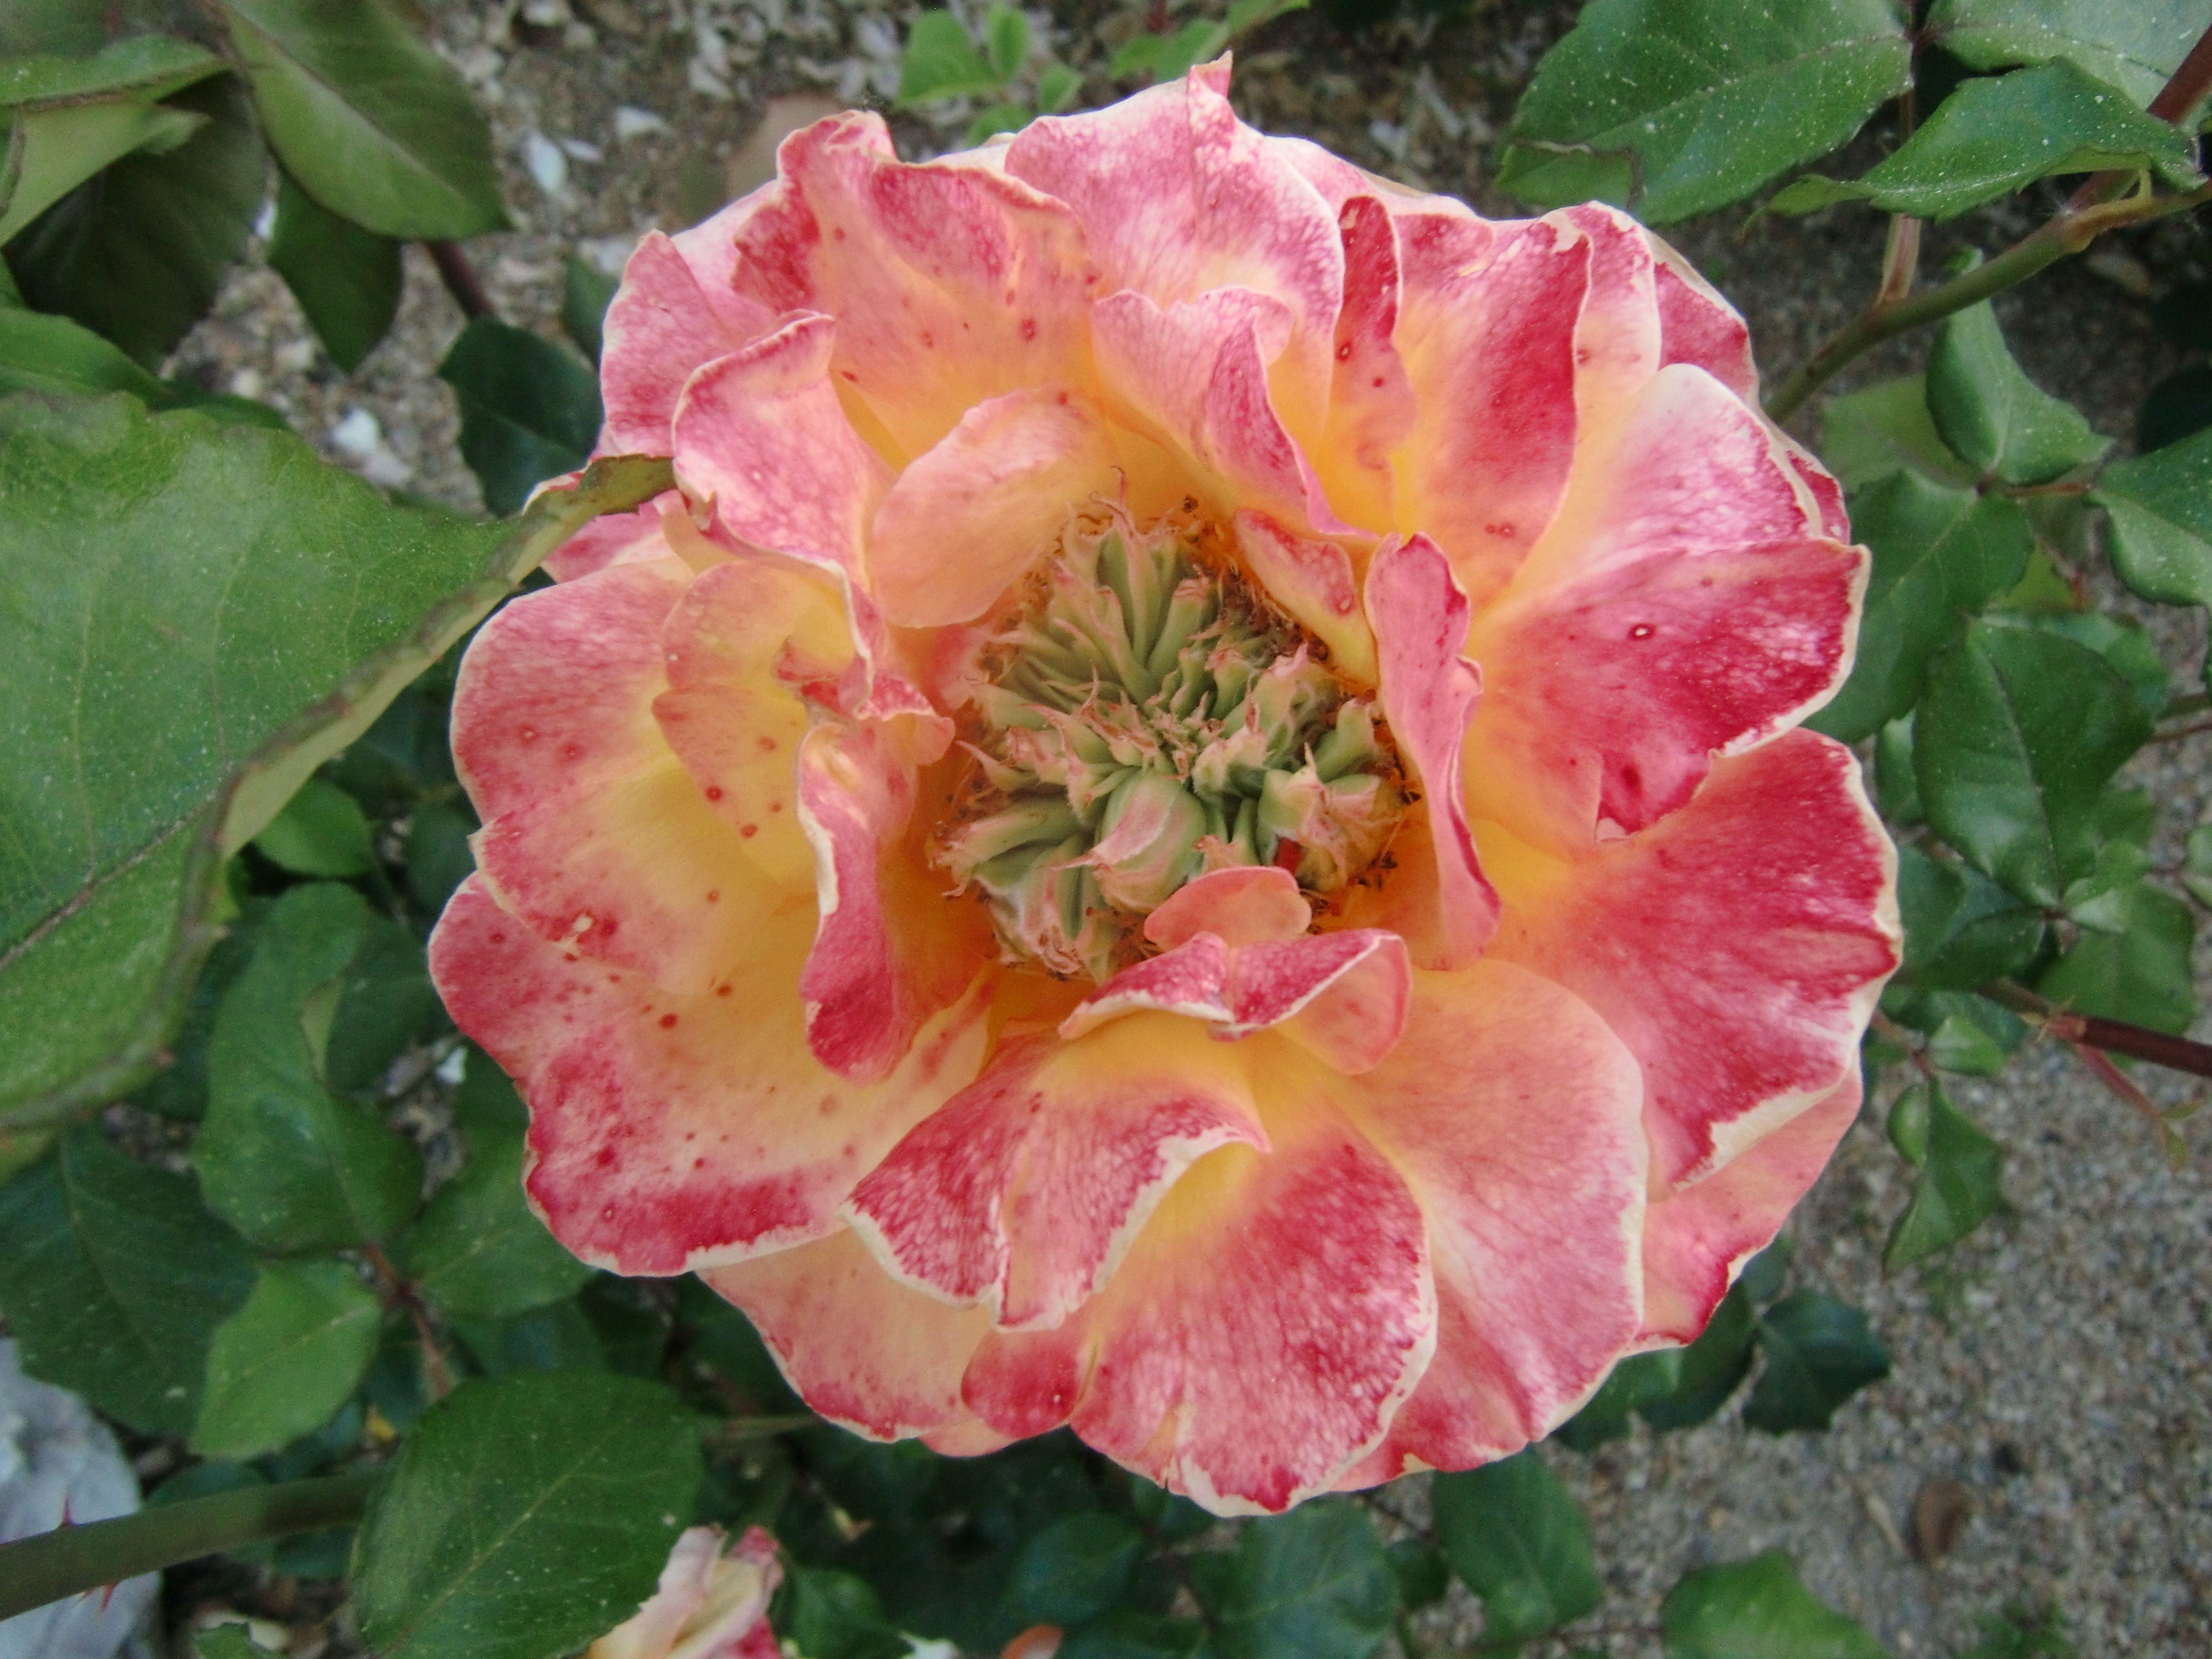 Rose from my gardem